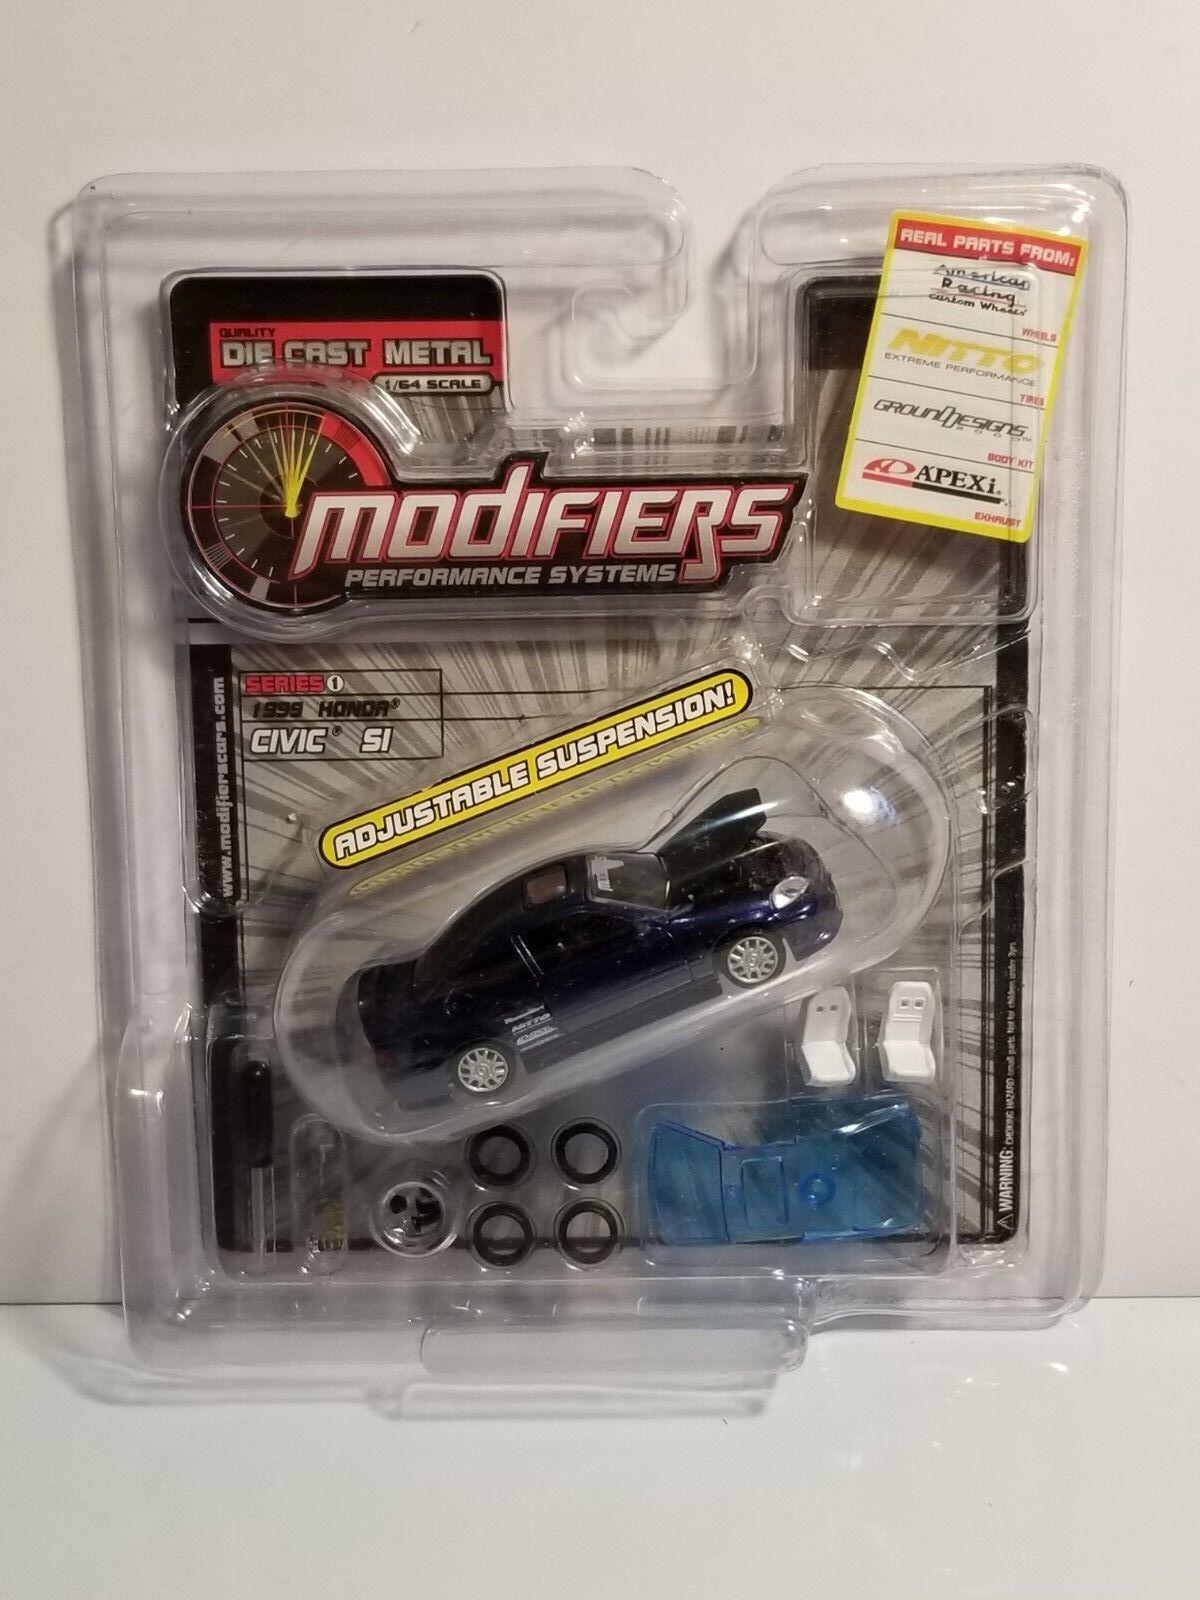 RARE Modifiers Series 1 1999 Honda Civic Die Cast Dark bluee 1 64 MODEL REPLICA